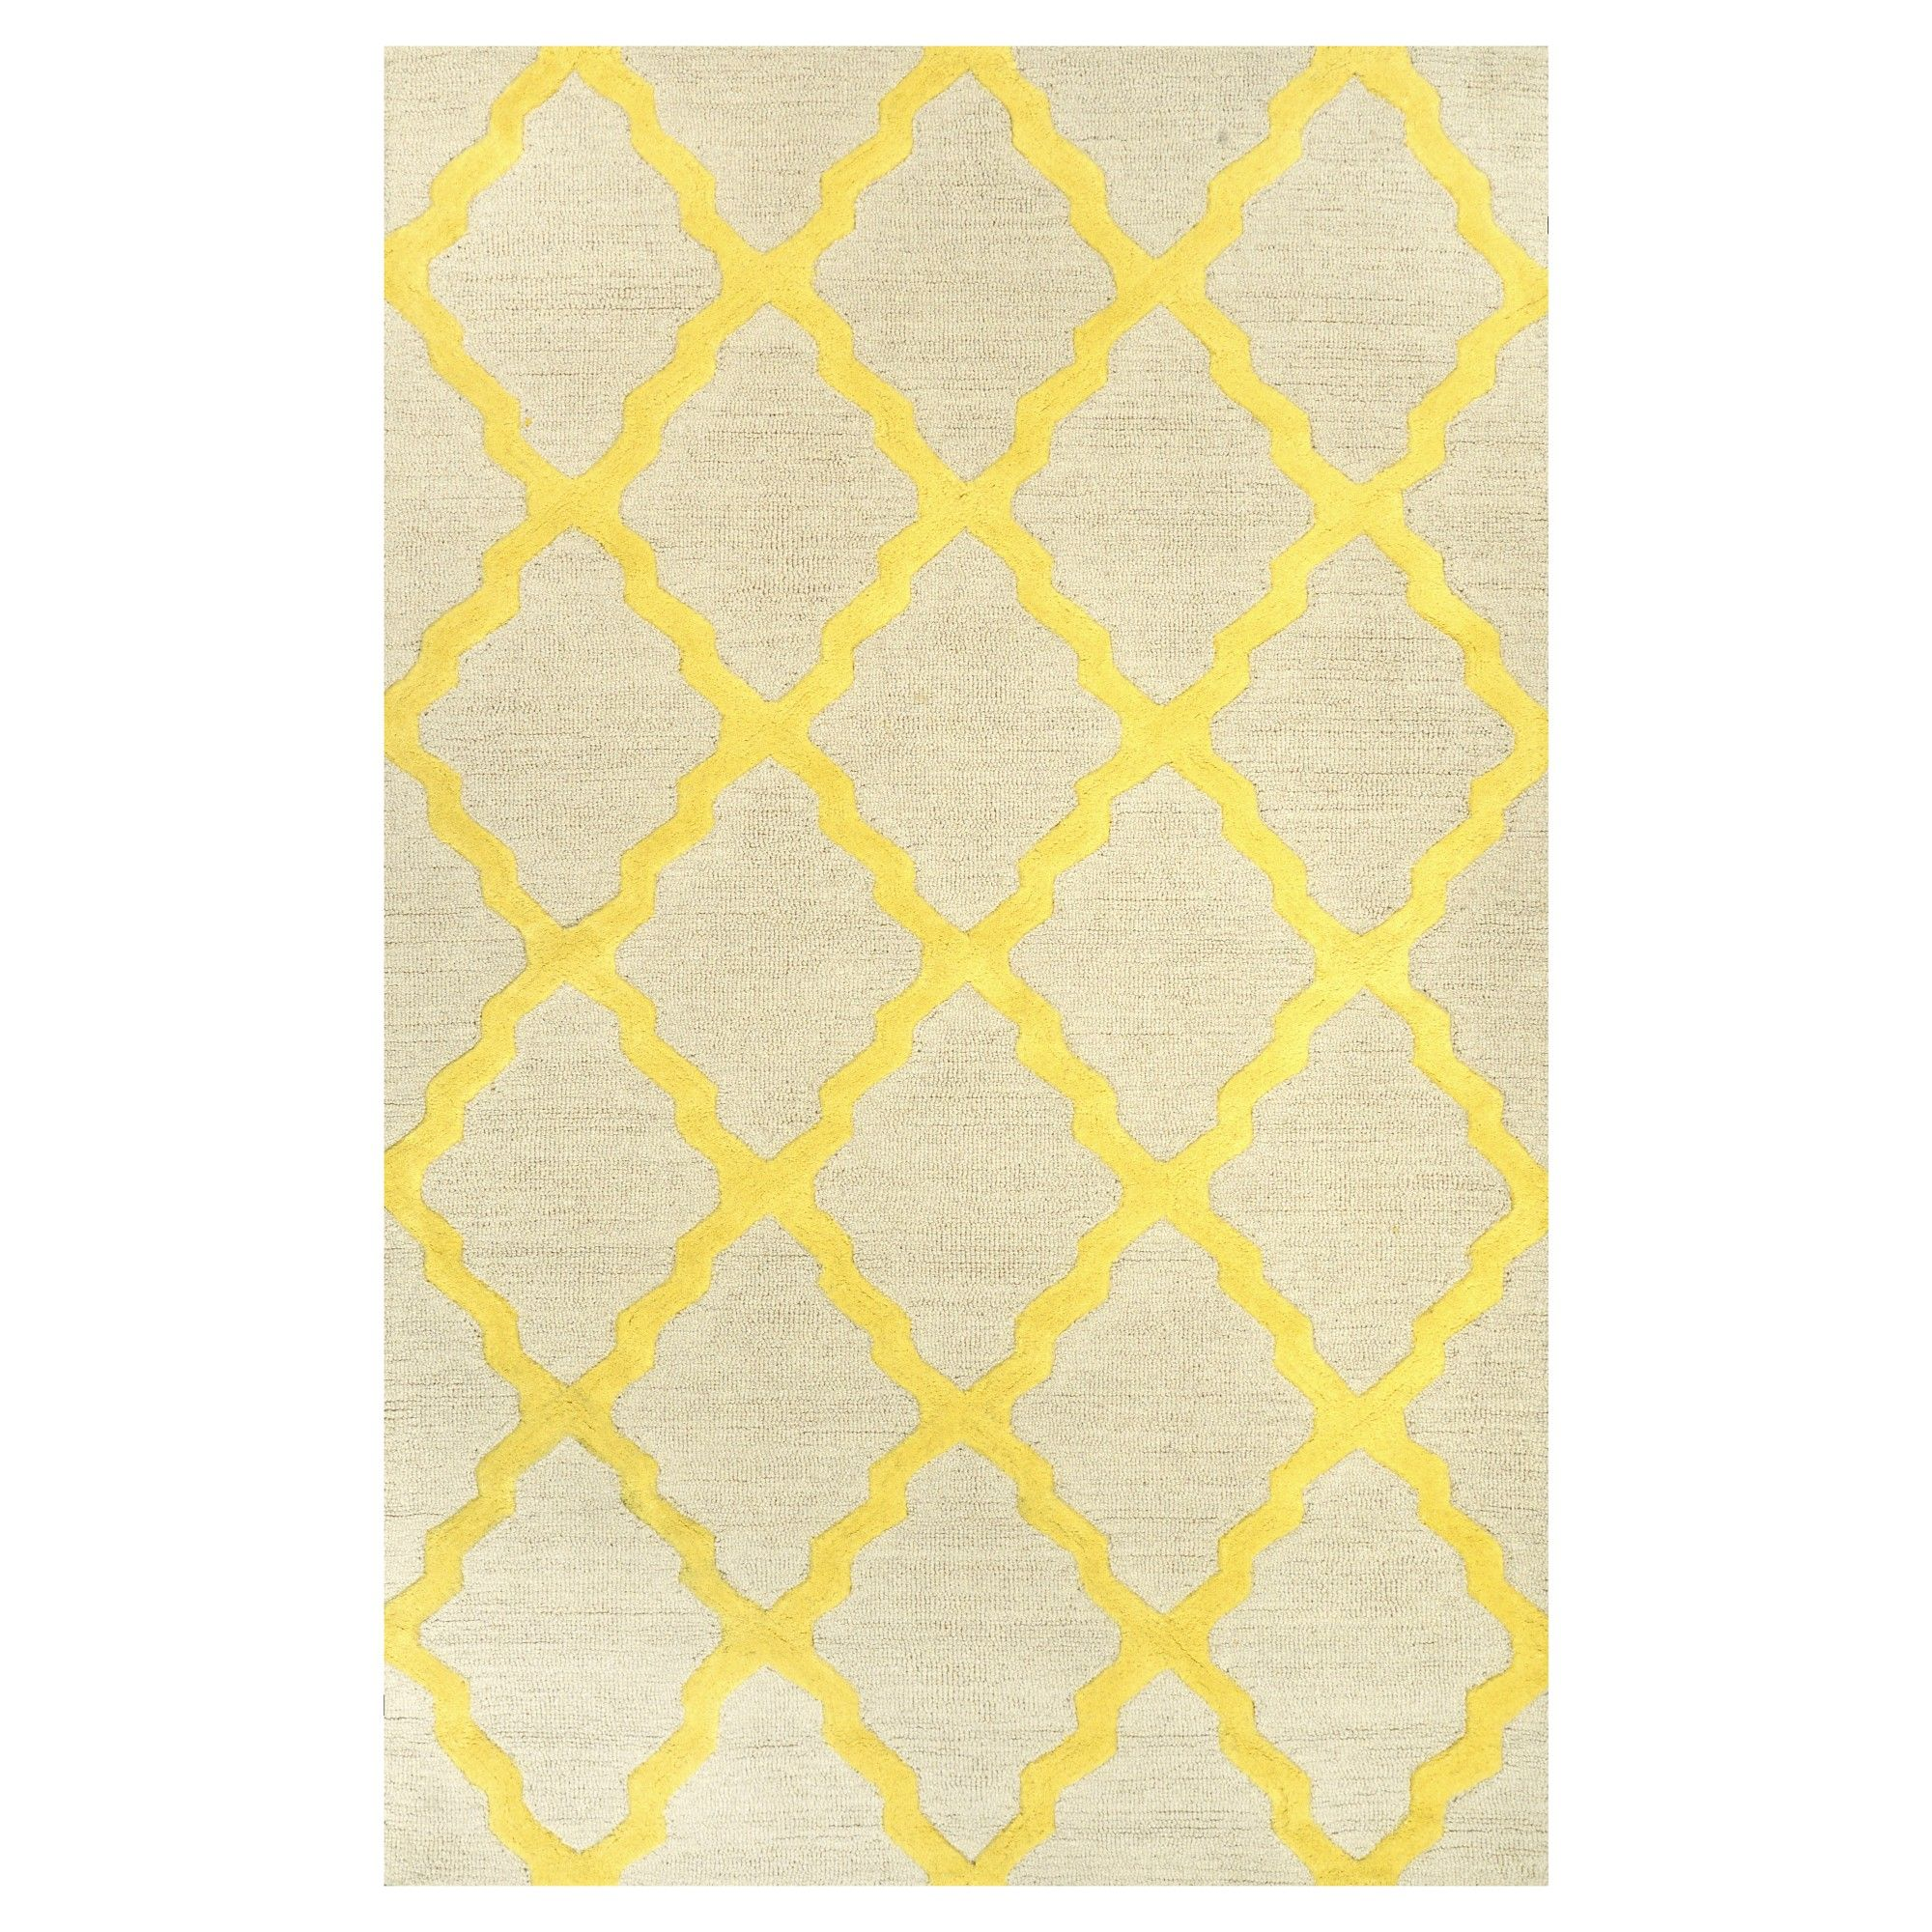 zm rug rectangular product nuloom aqua area rugs wool lindy bodrum vintage